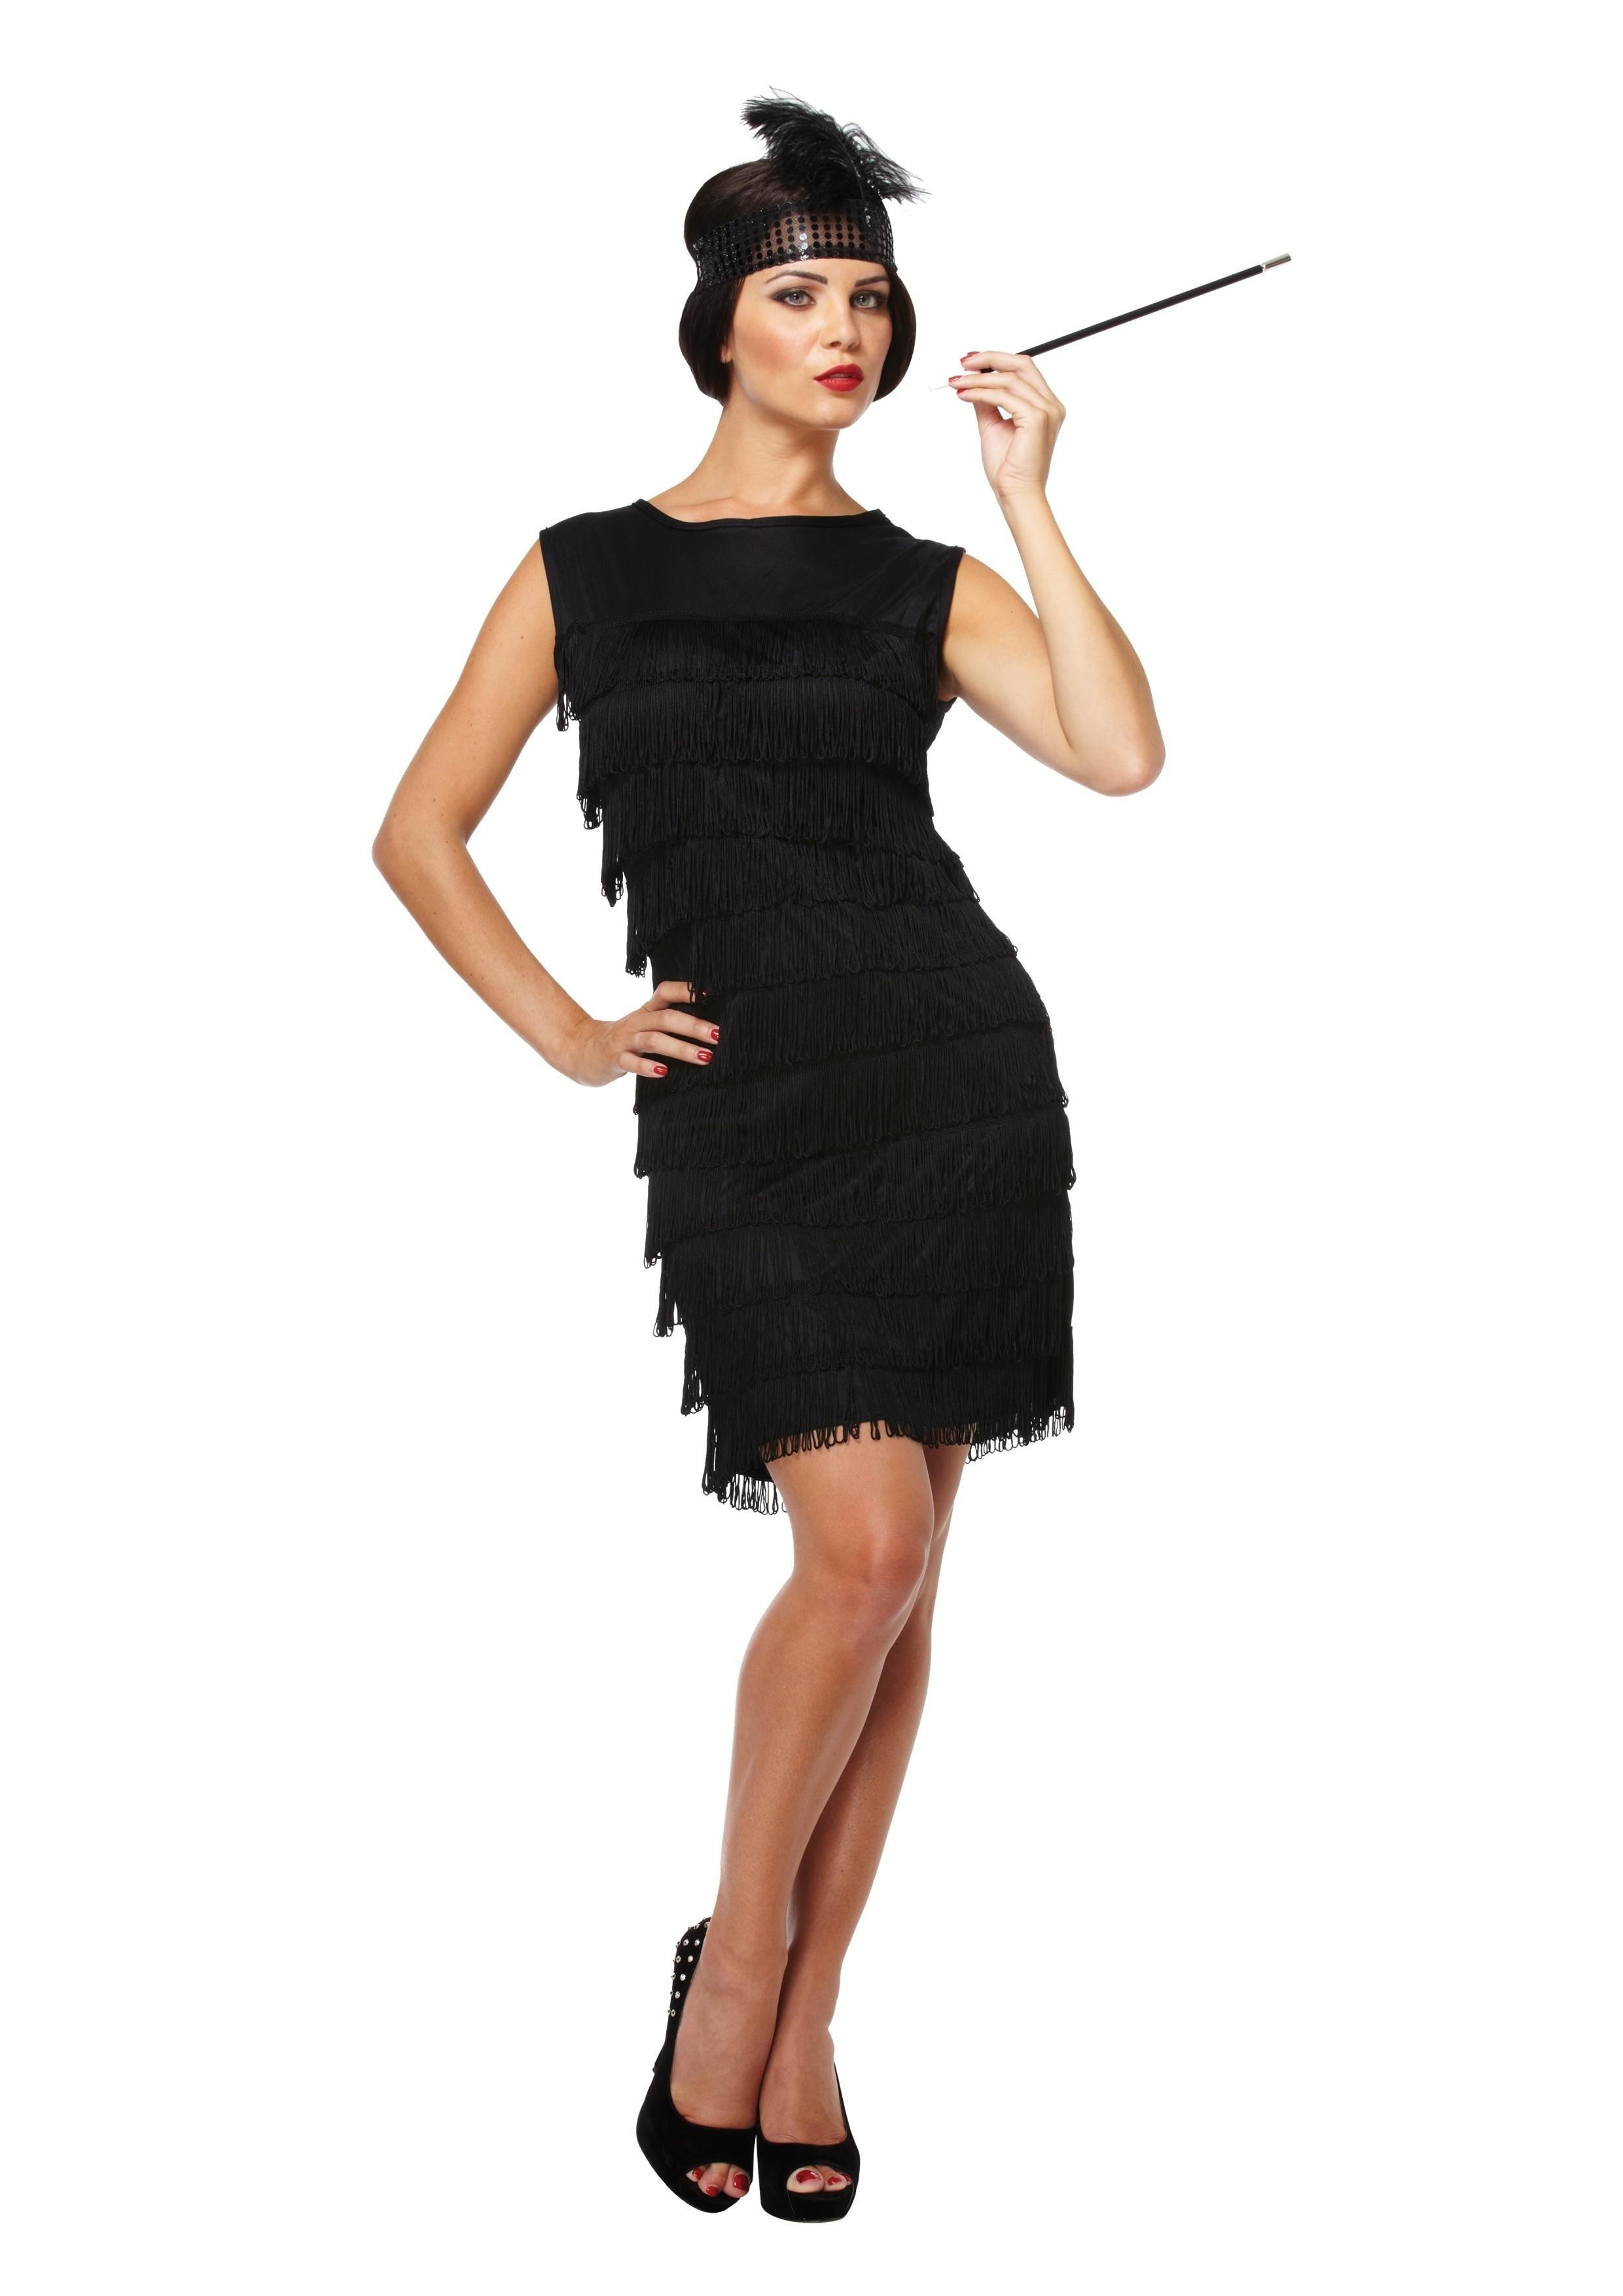 Jaren 20 jurkje zwart kopen Confettifeestnl